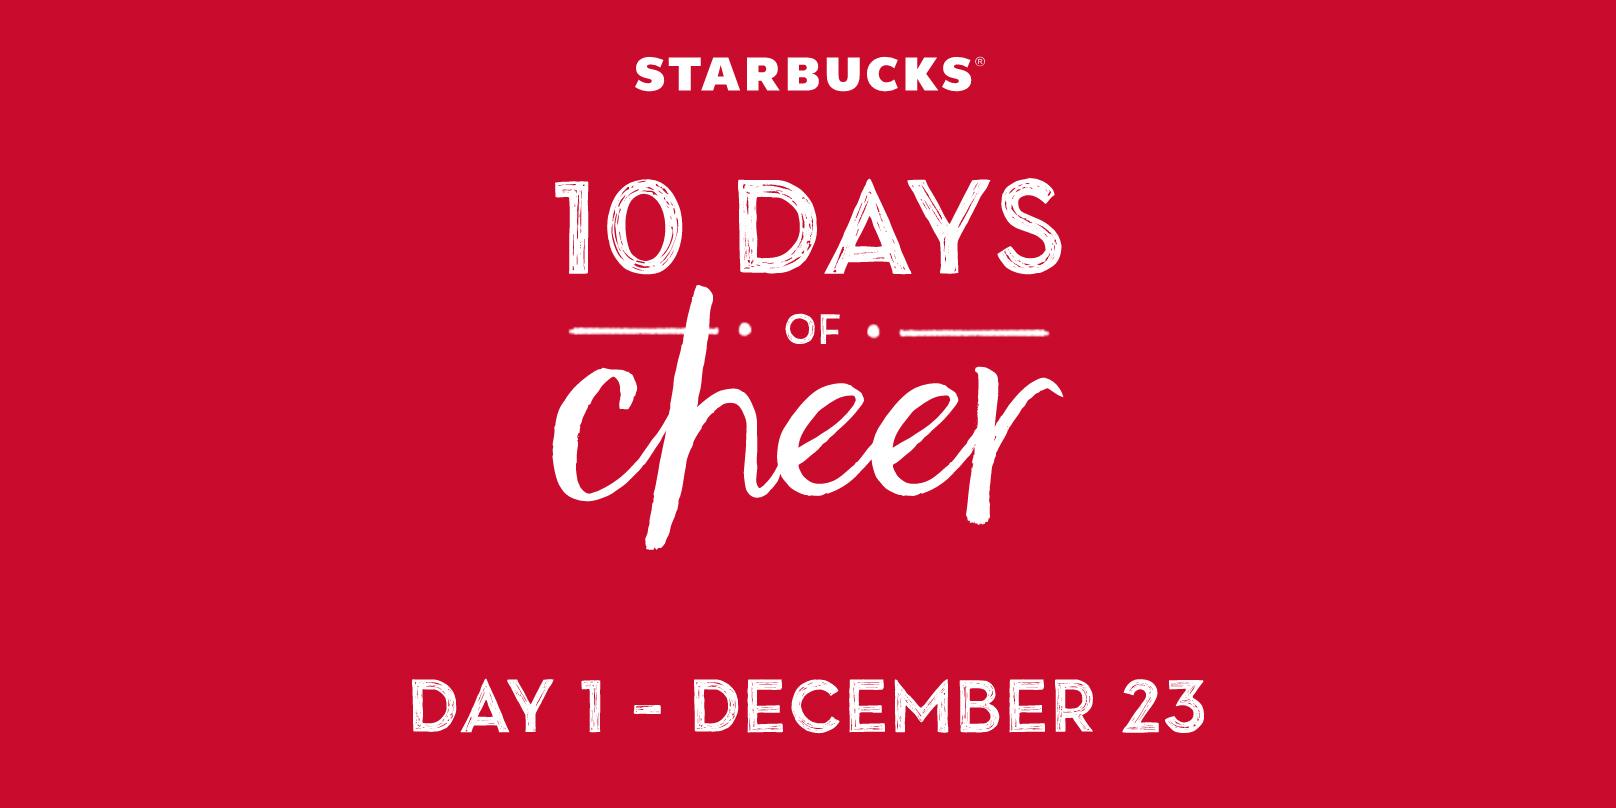 starbucks-10-days-cheer-promotion